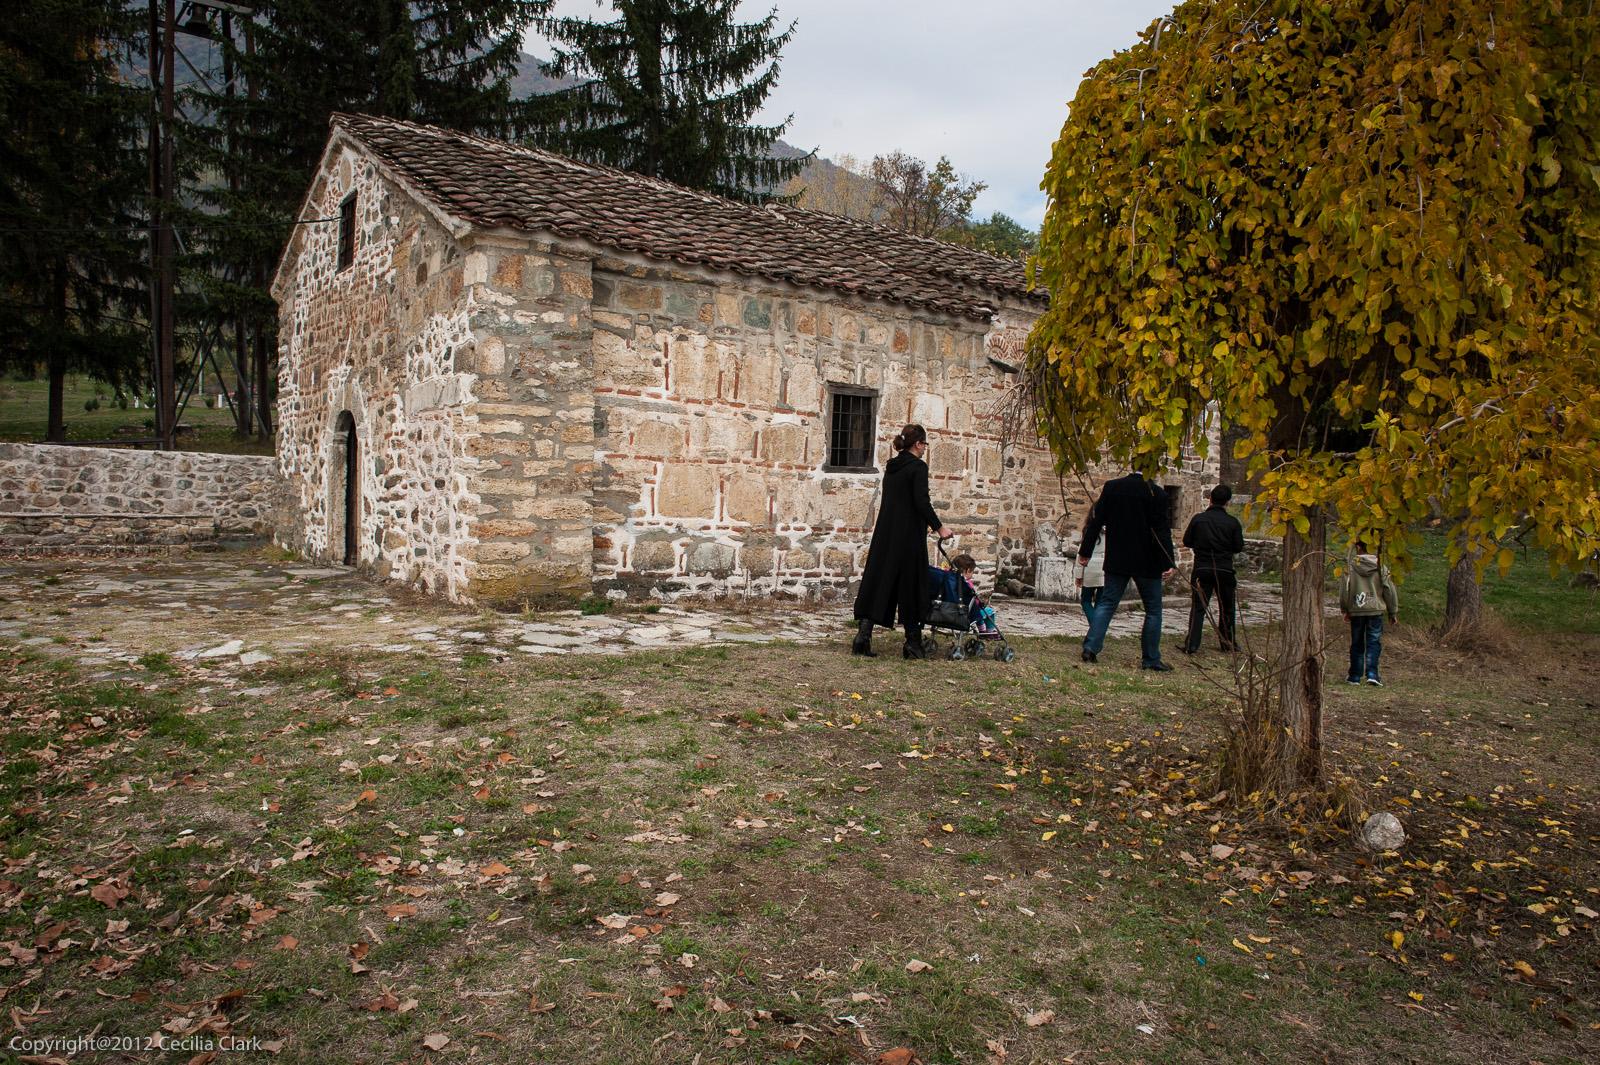 Vacationtraveladventure Zrze And Tetovo November 4 2012